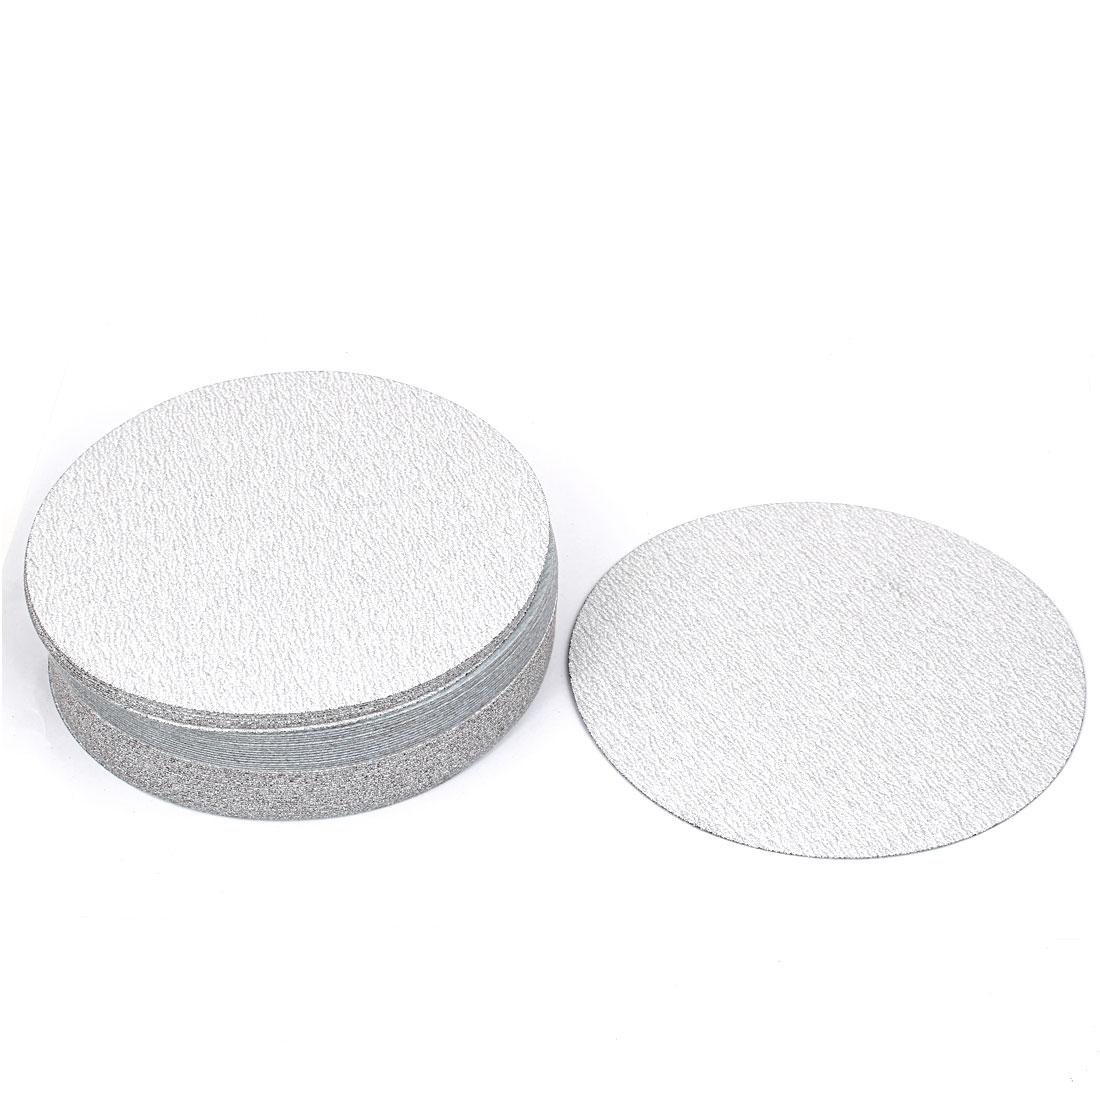 "7"" Dia Polishing Round Dry Abrasive Sanding Sandpaper Sheet Disc 180 Grit 50pcs"